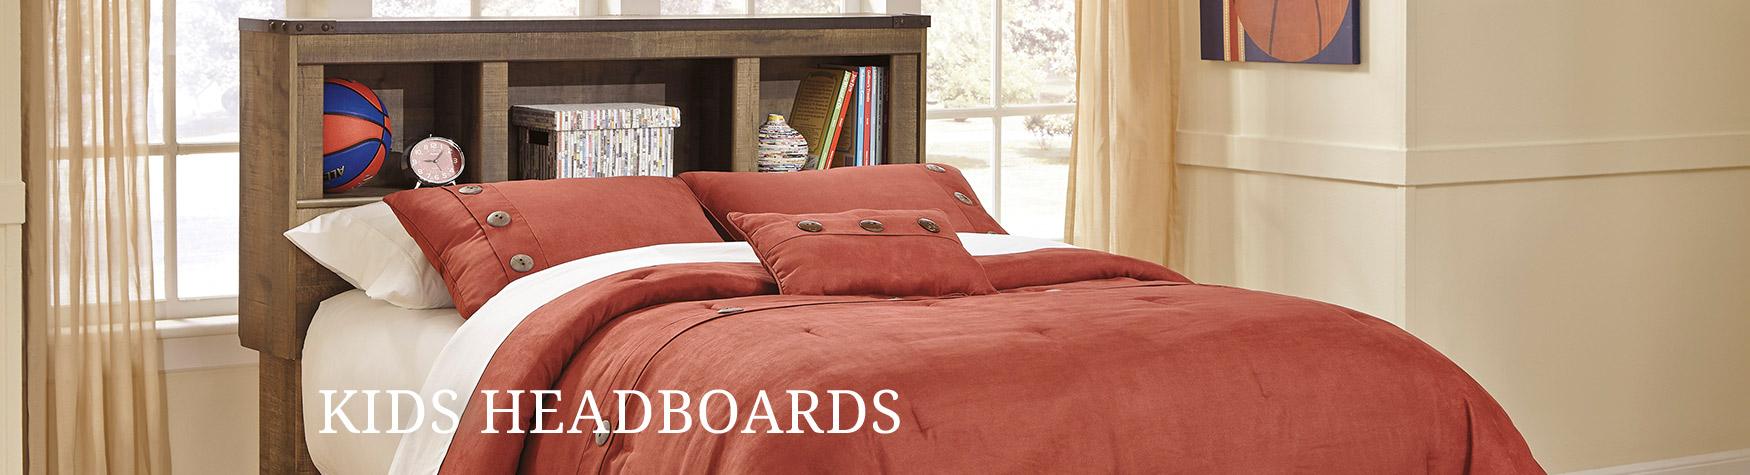 kids-headboards-banner-1.jpg